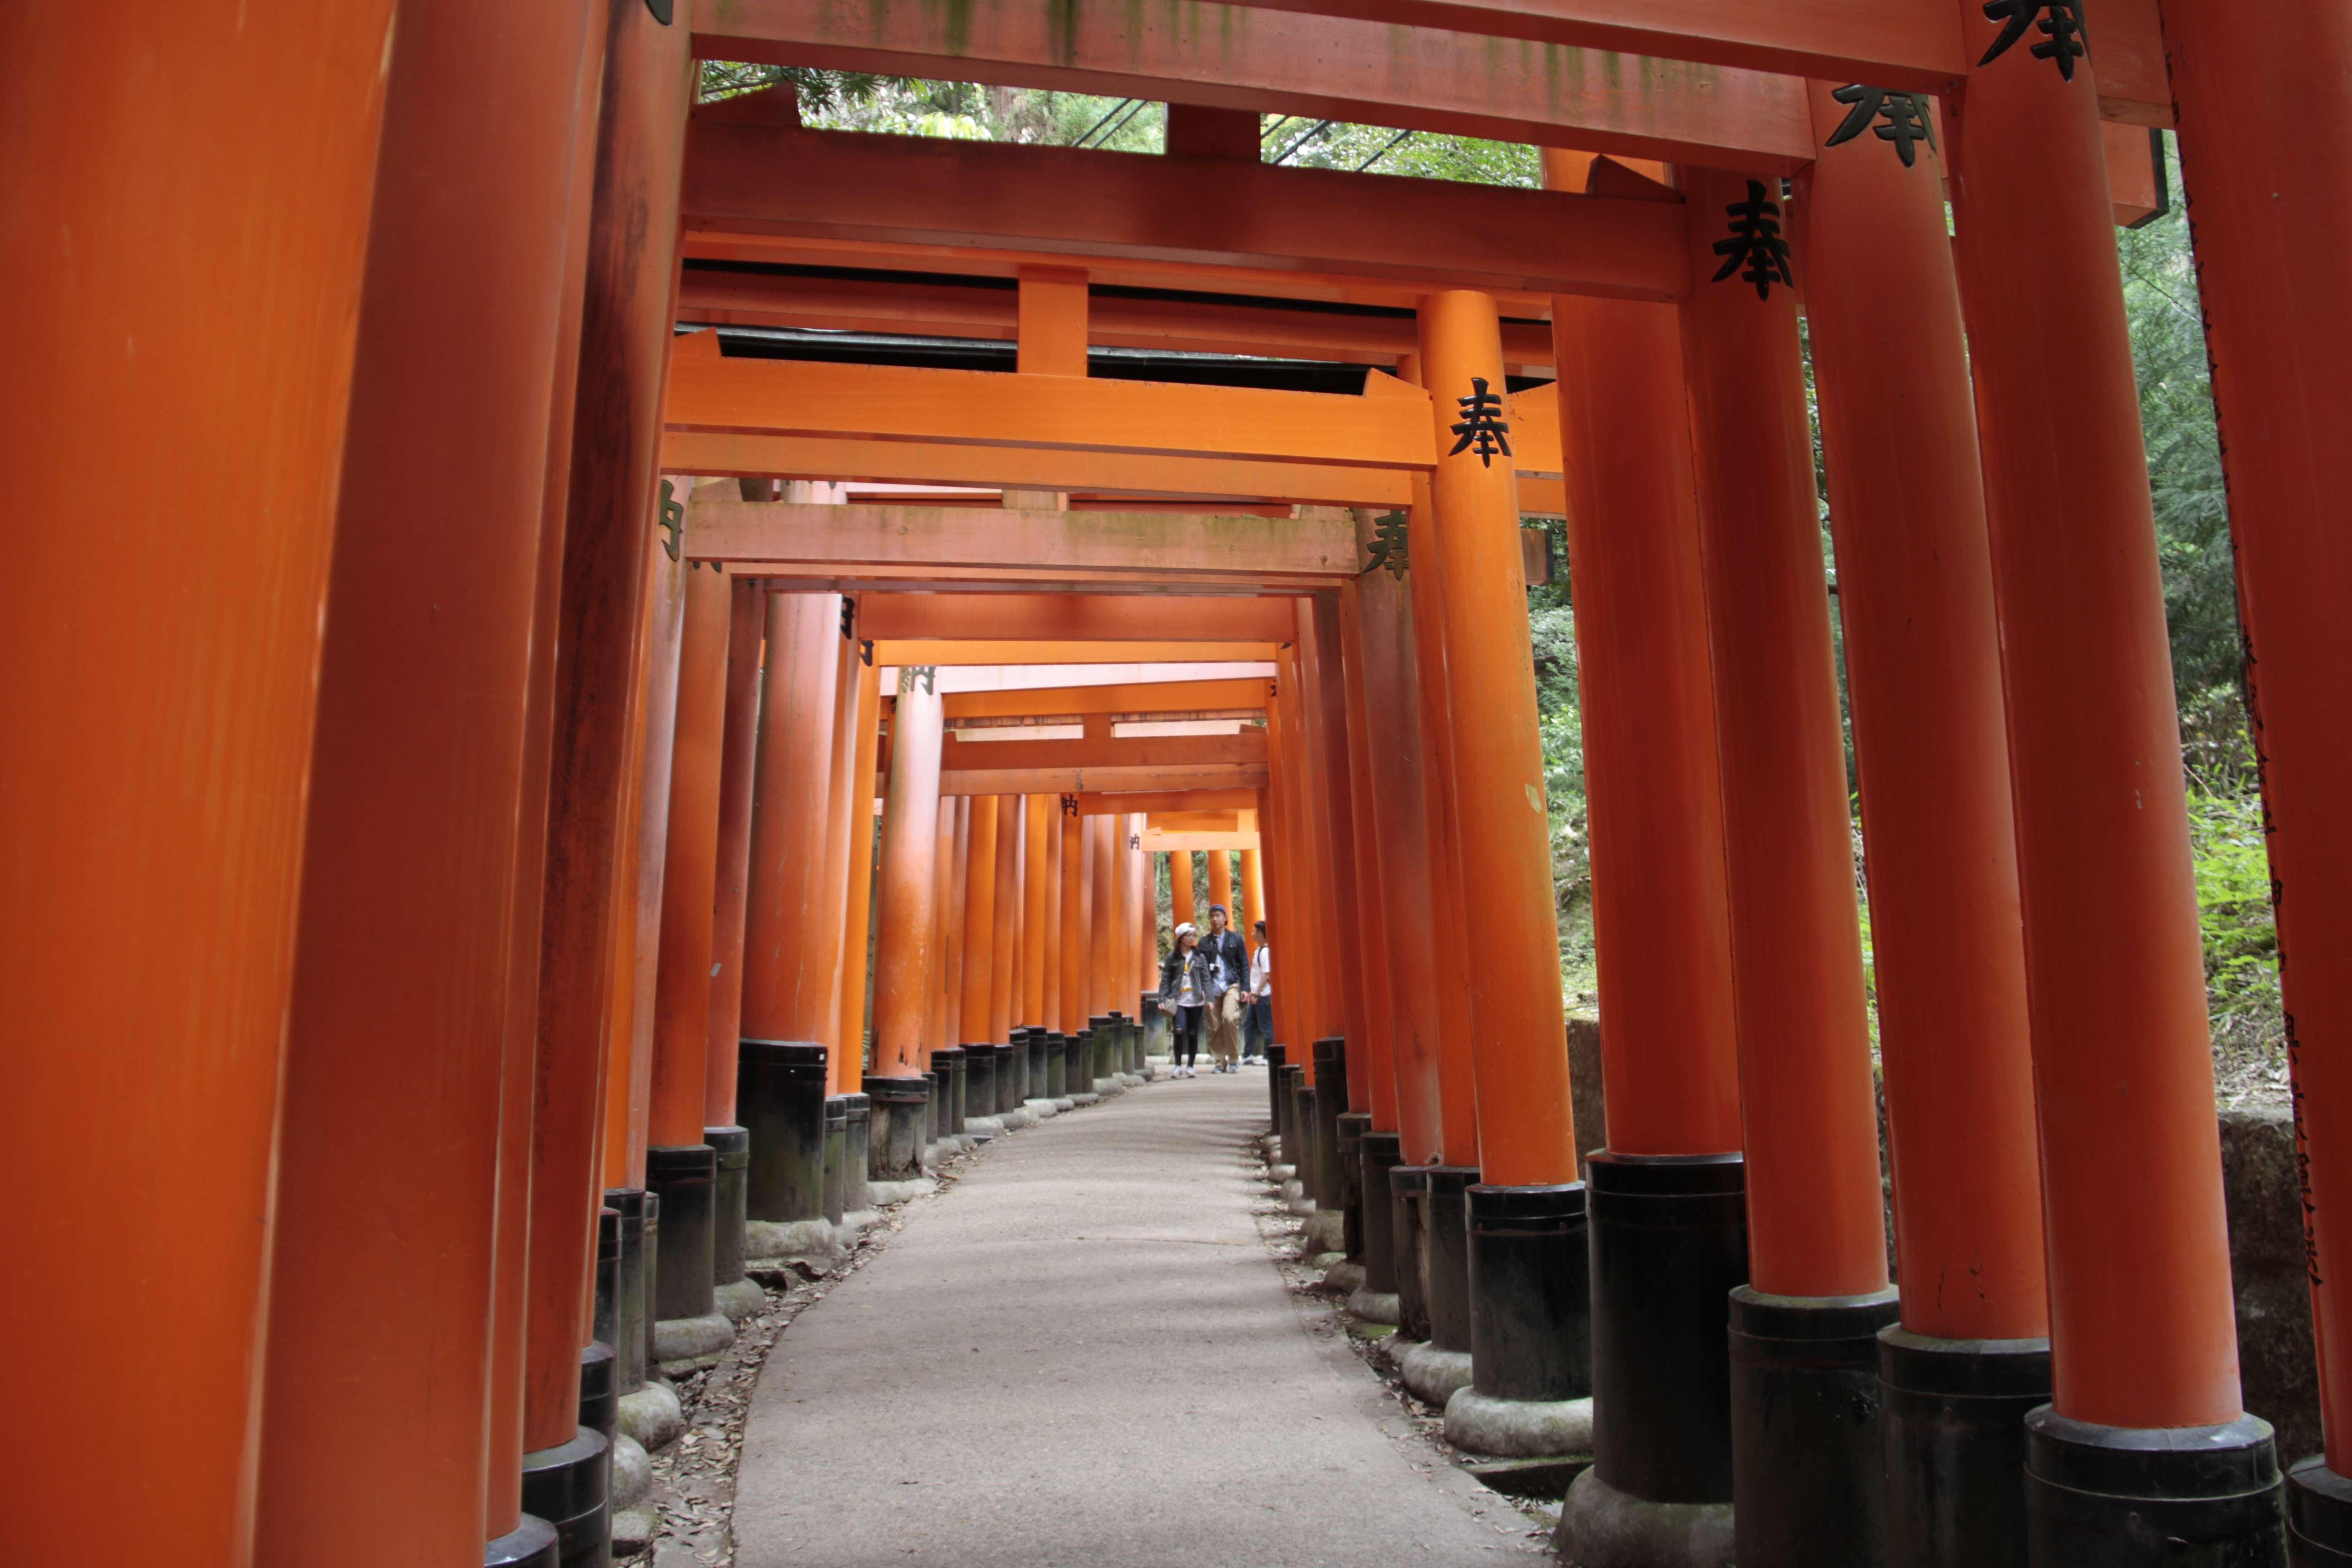 Japon avril 2017_0856 Kyoto sanctuaire shinto Fushimi Inari